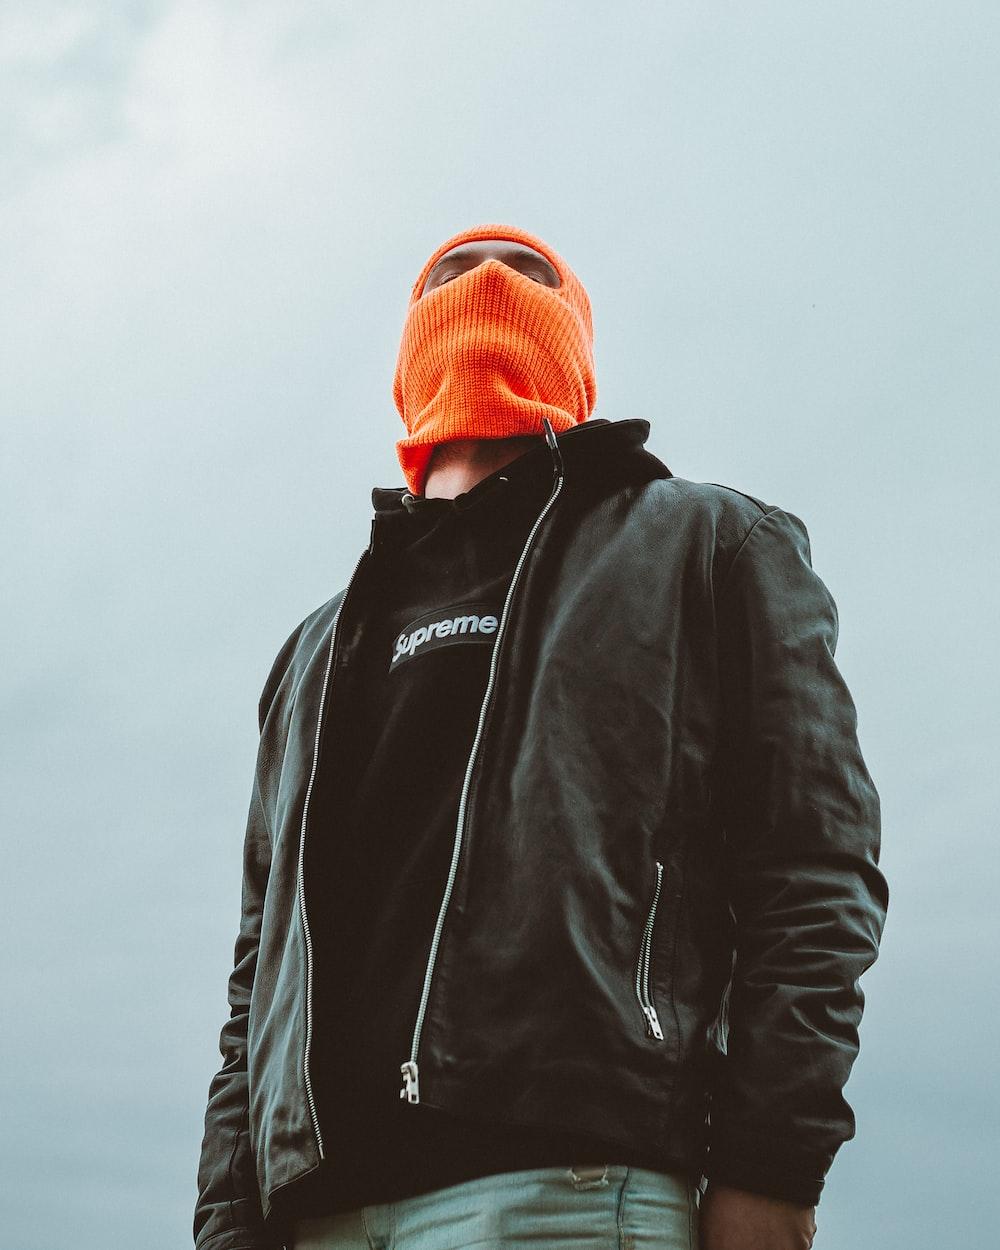 man in black jacket and orange knit cap